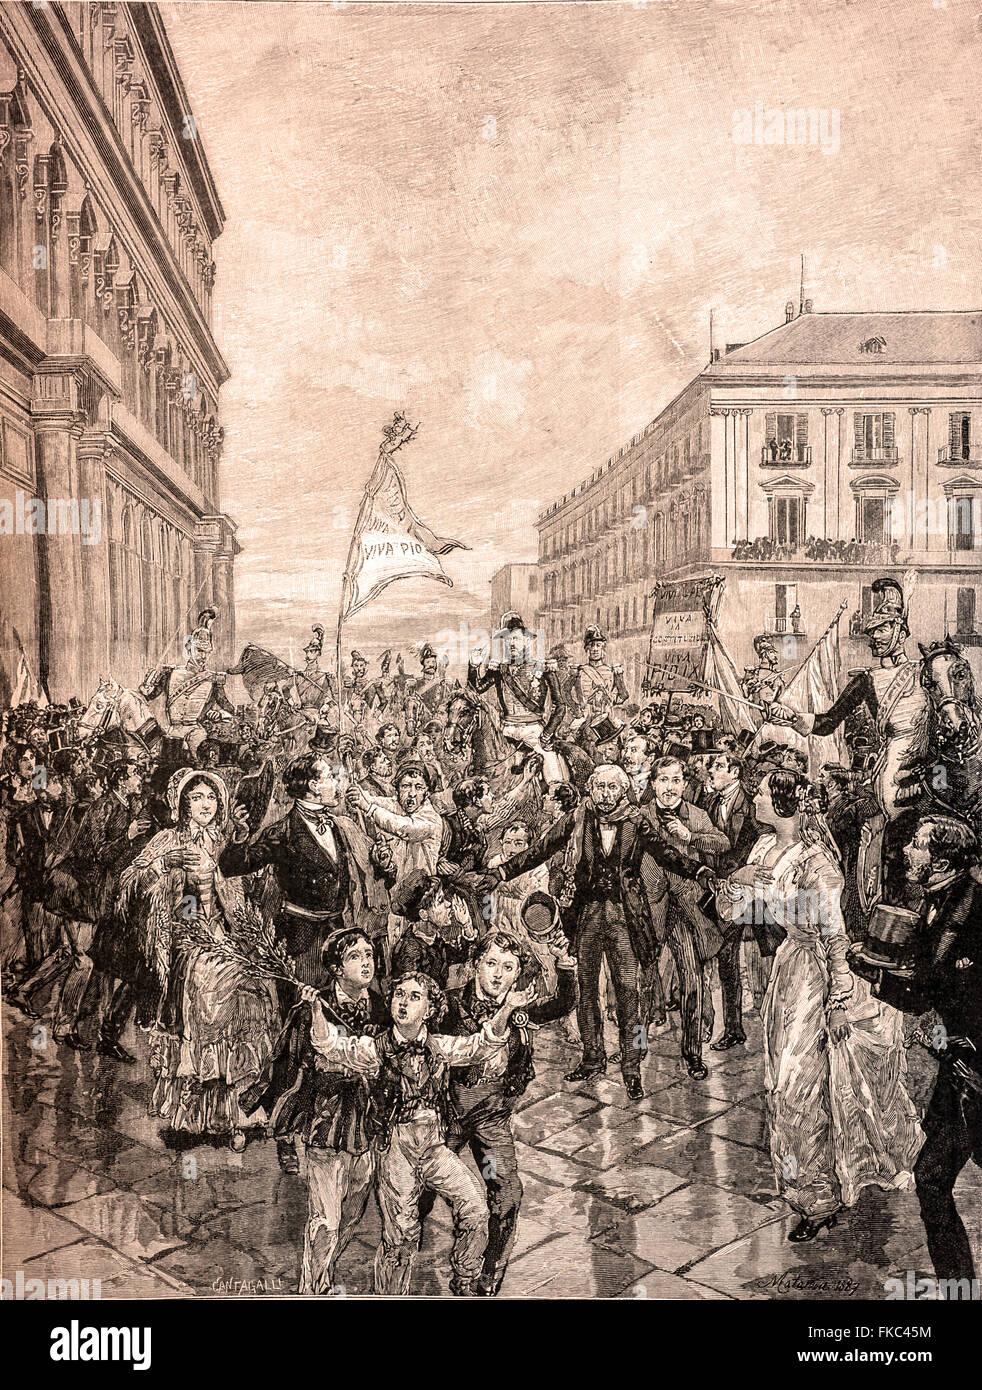 Risorgimento italien Acclamation de Ferdinand II de Bourbon Jura Constitution 24 Février 1848 Photo Stock